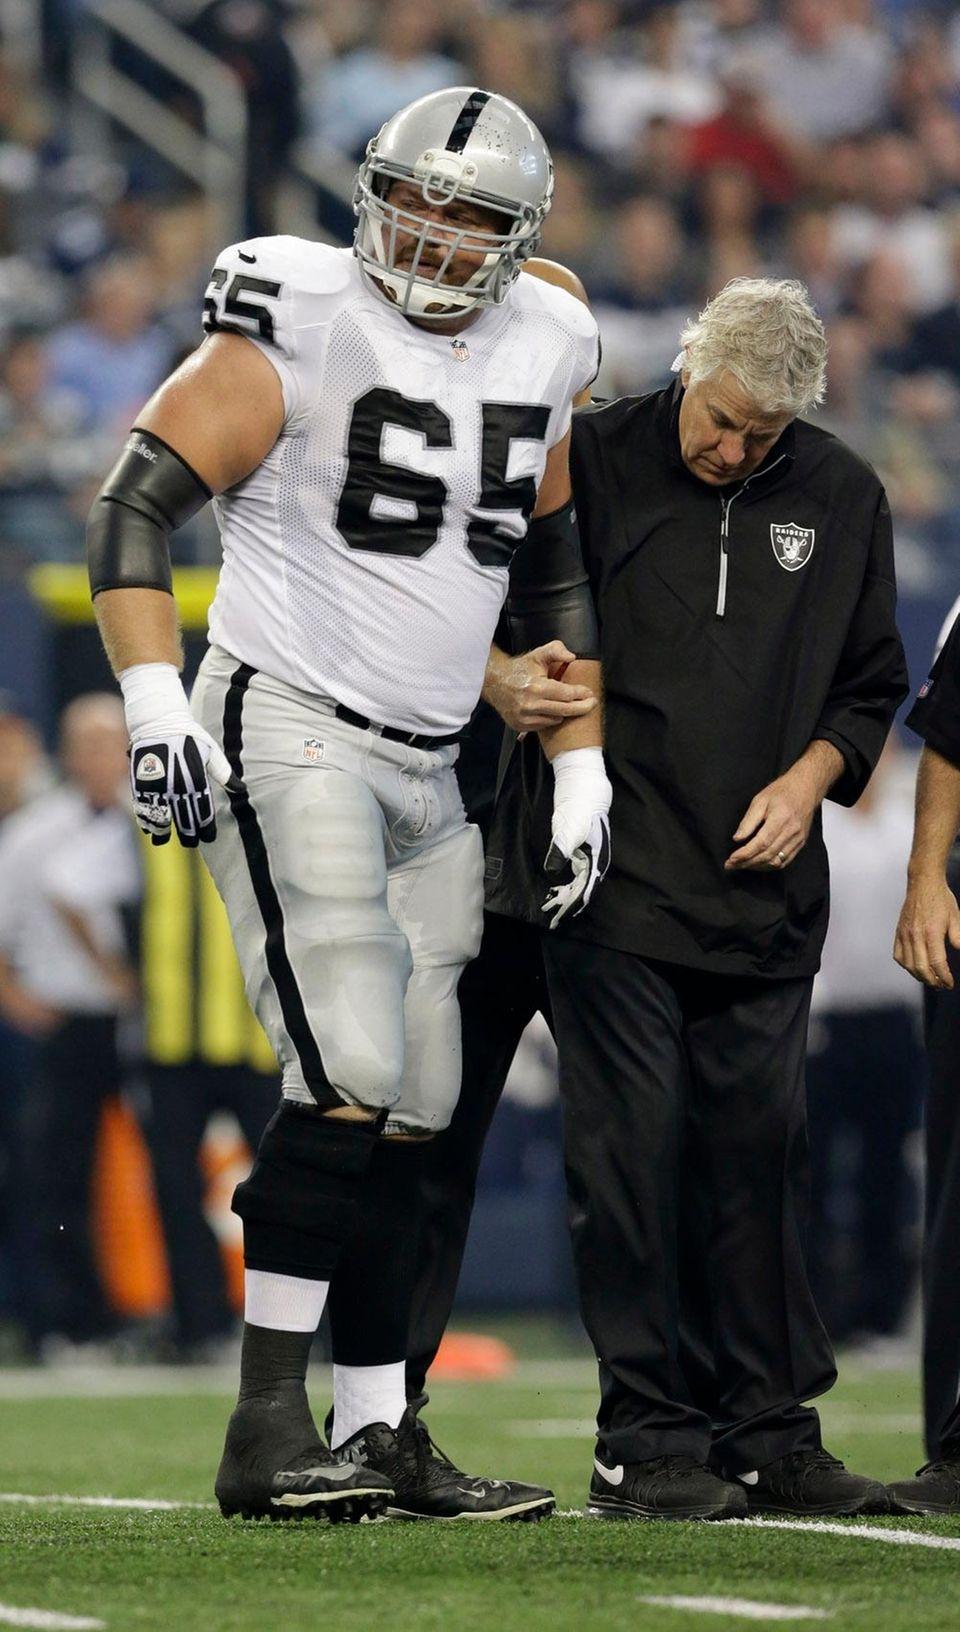 Oakland Raiders guard Mike Brisiel (65) is helped